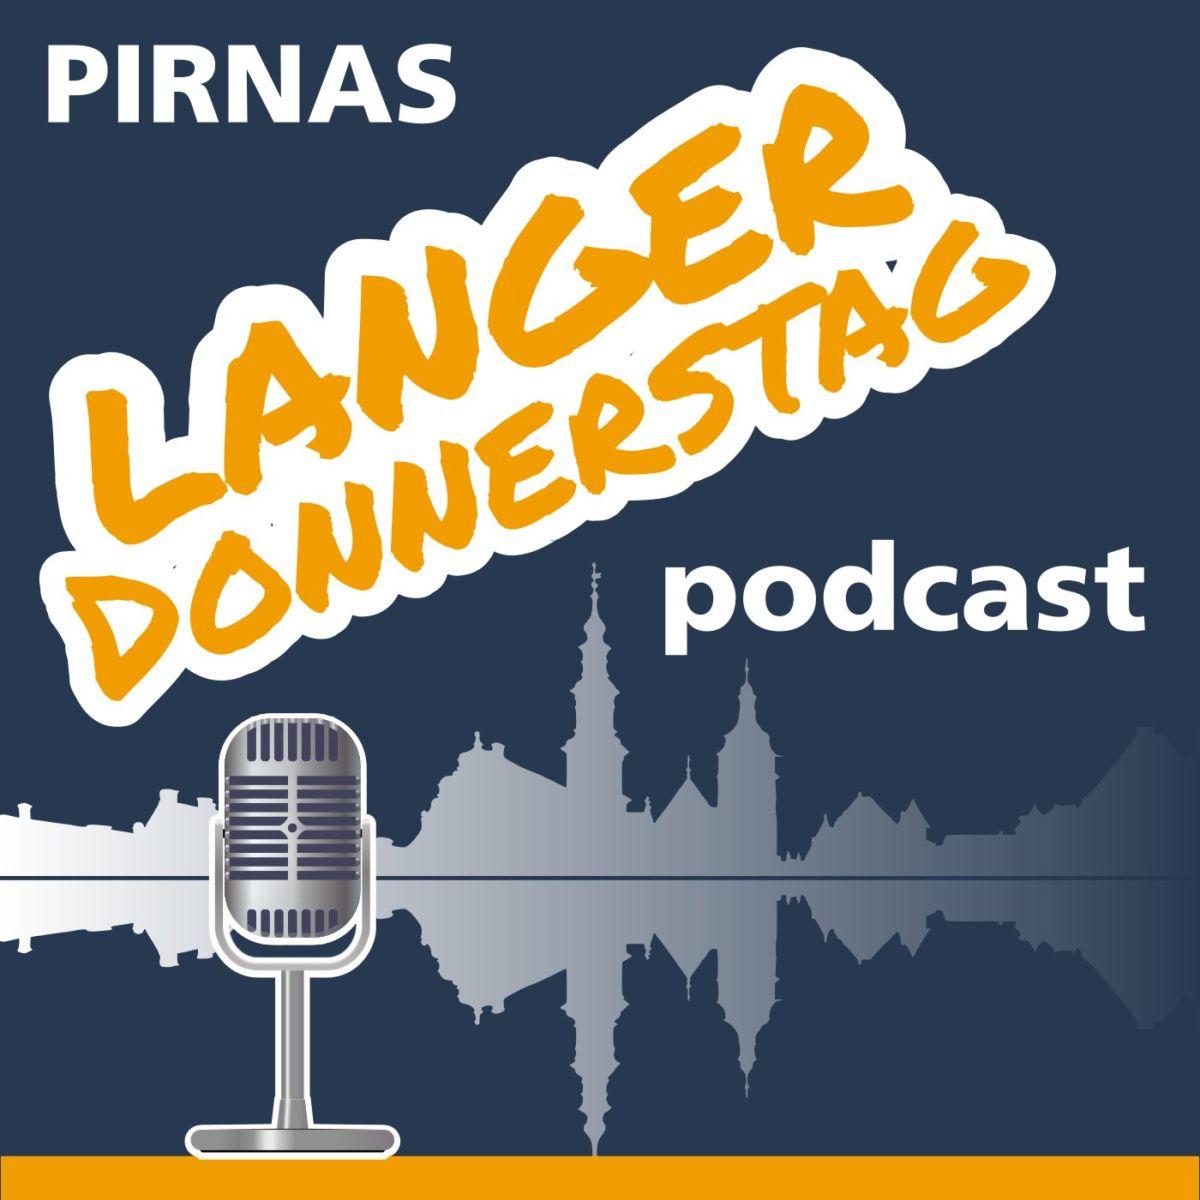 langer-donnerstag-podcast-02-1400x1400